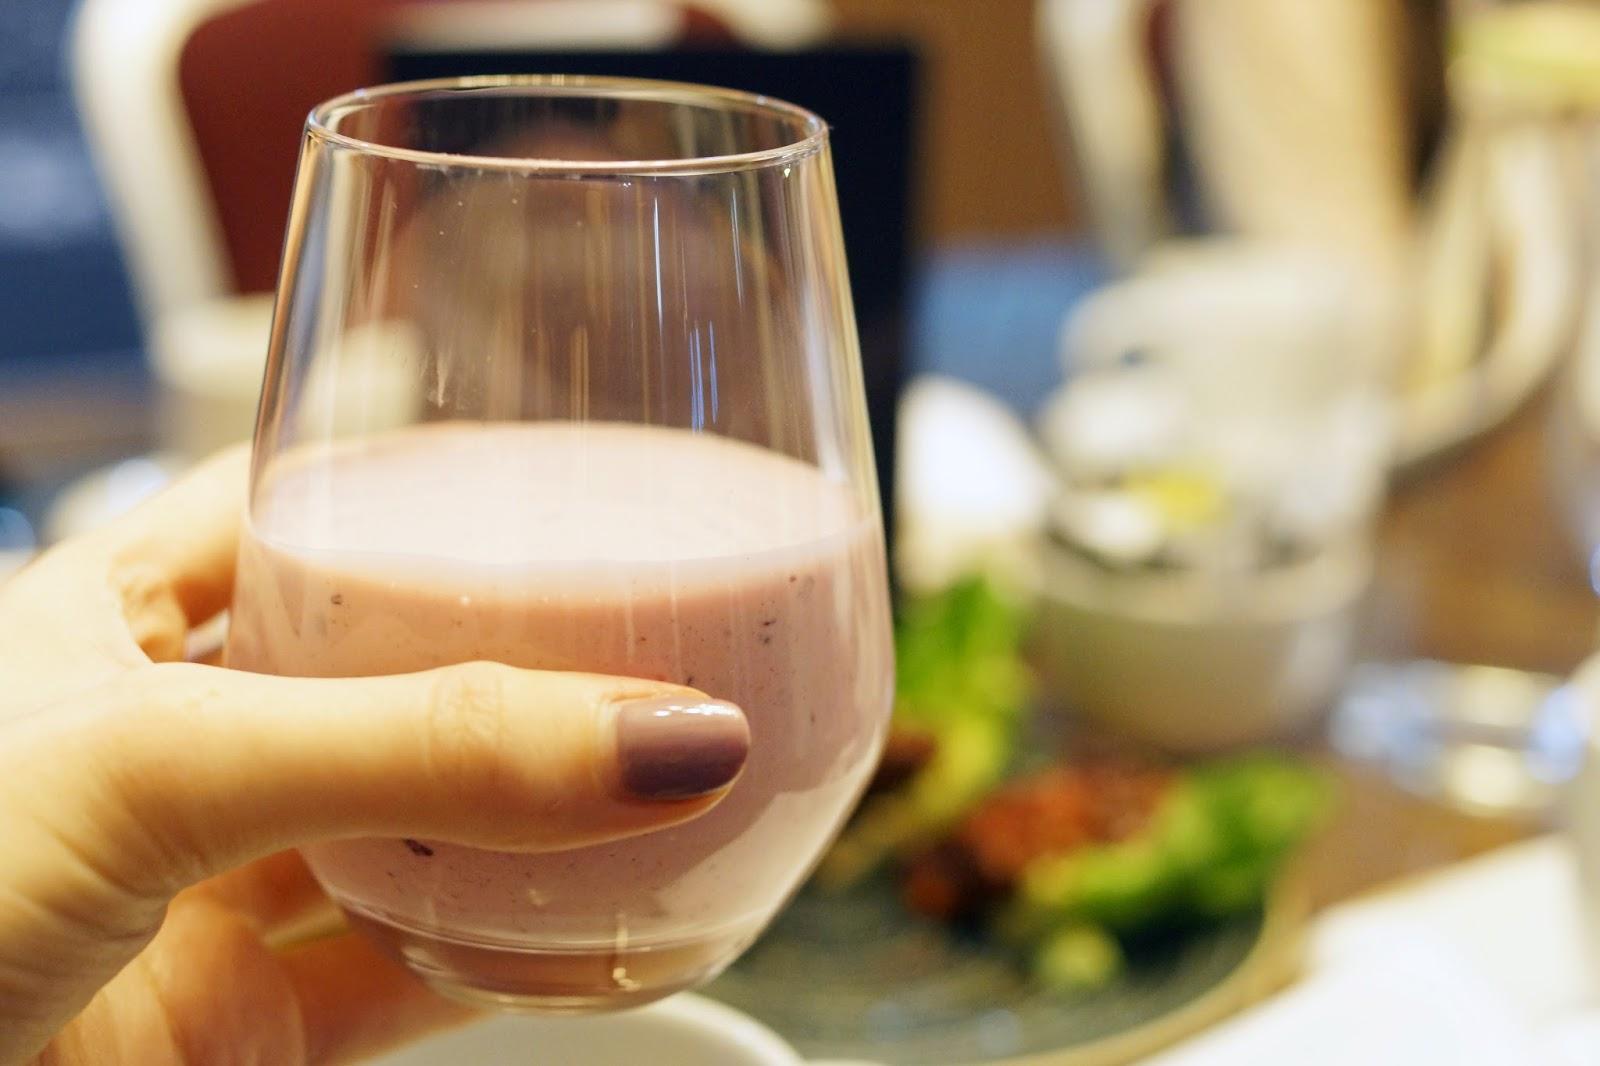 Hello Freckles Afternoon Tea American Sliders Calzone Hilton Garden Inn Sunderland Food Review Milkshake